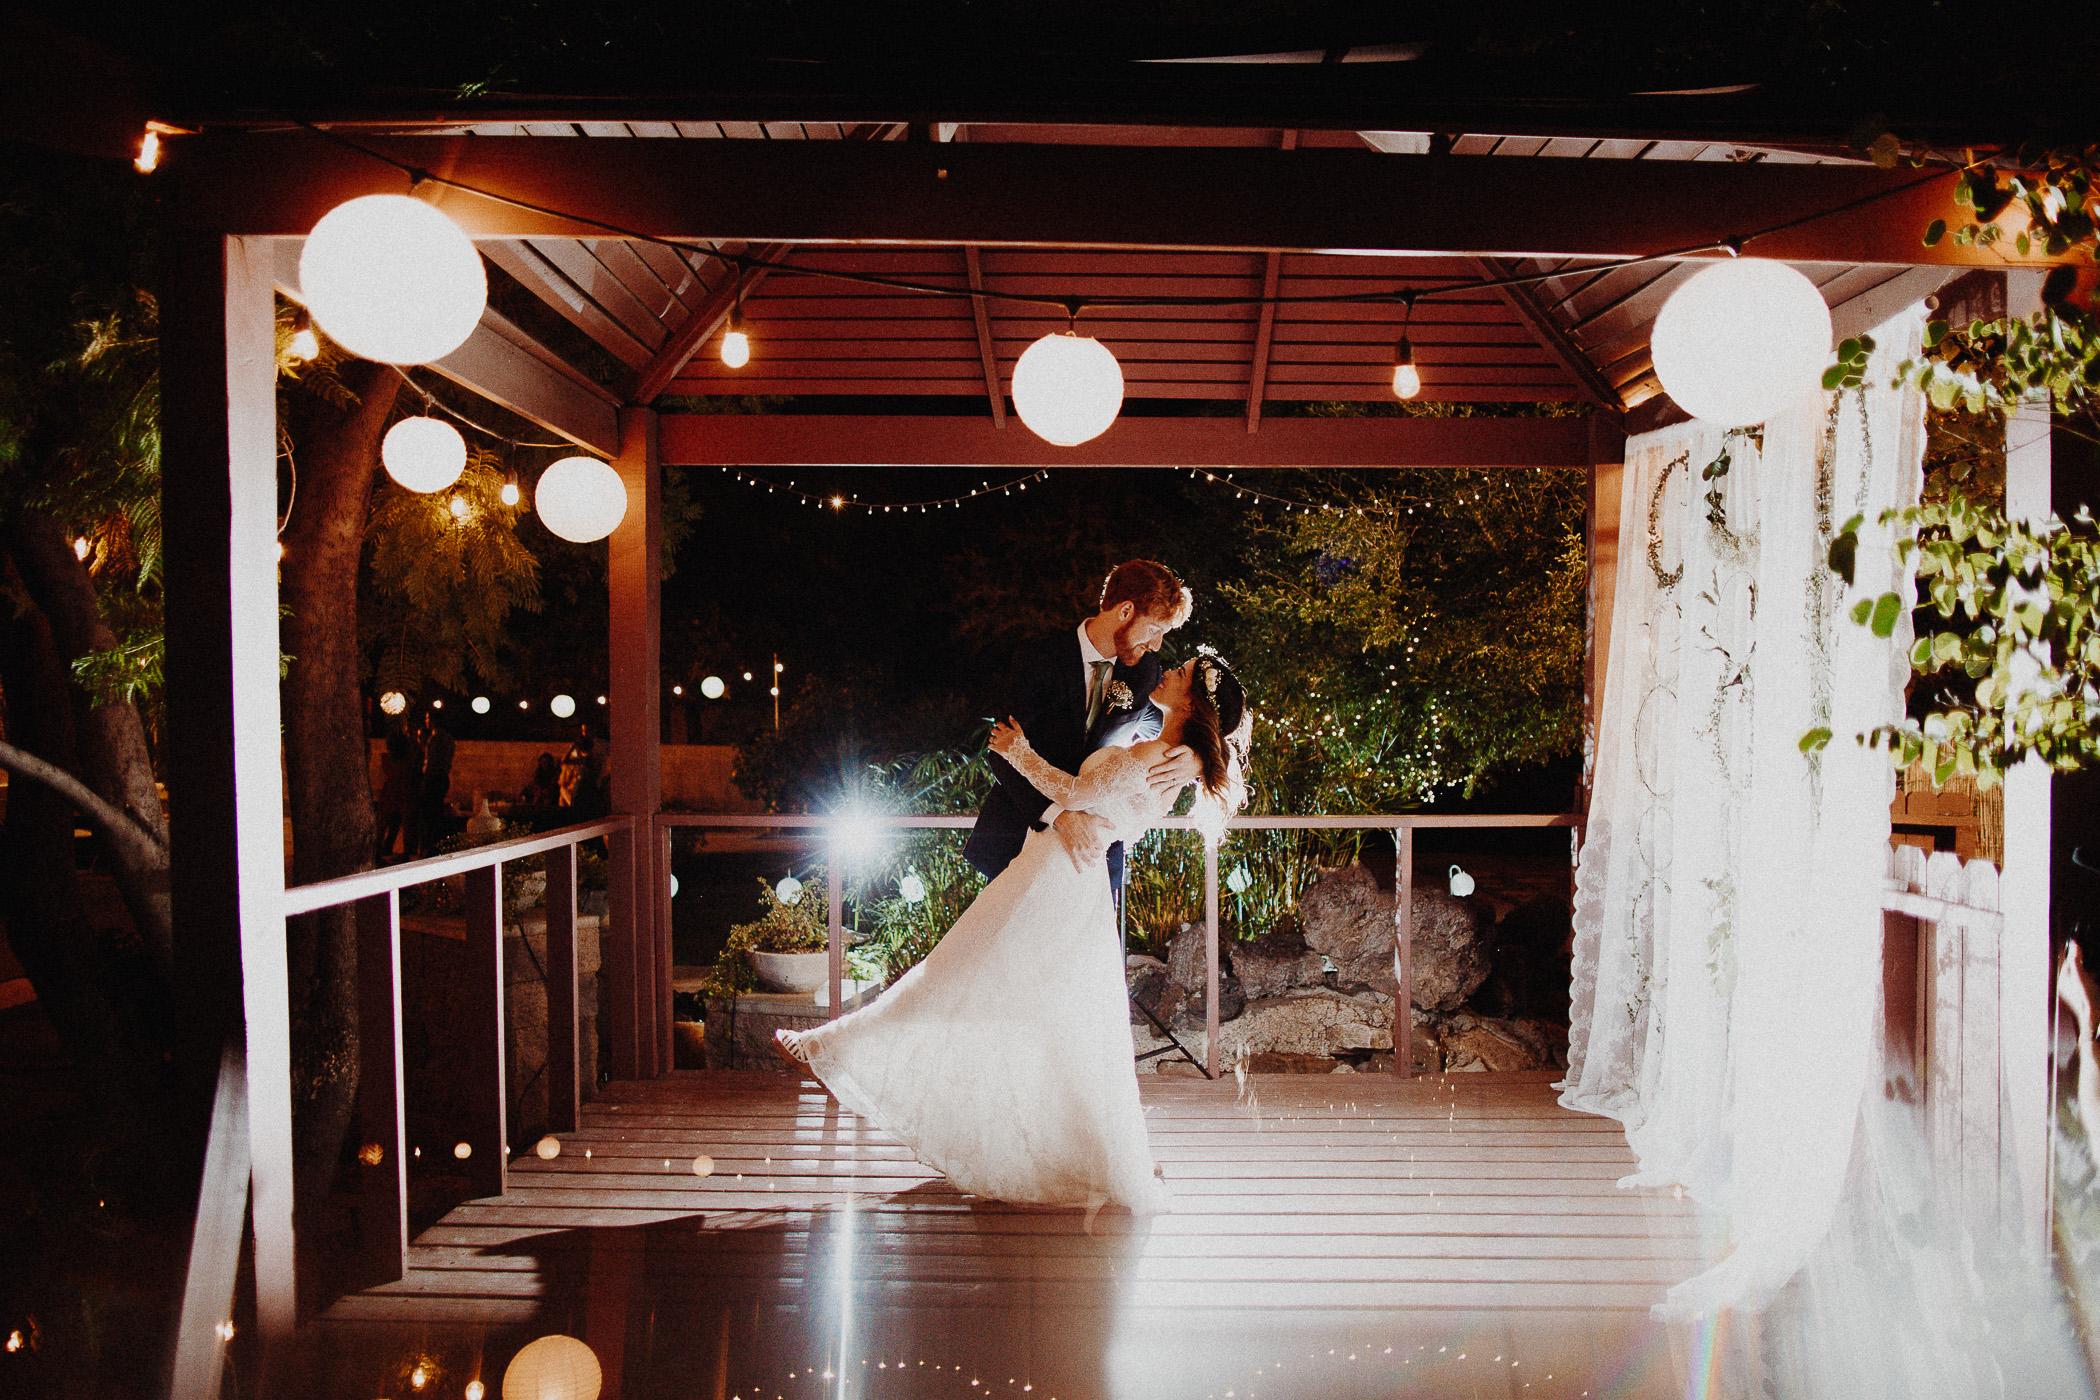 181104-Luxium-Weddings-Arizona-@matt__Le-Brandon-Kariana-Phoenix-Valley-Garden-Center-1148.jpg